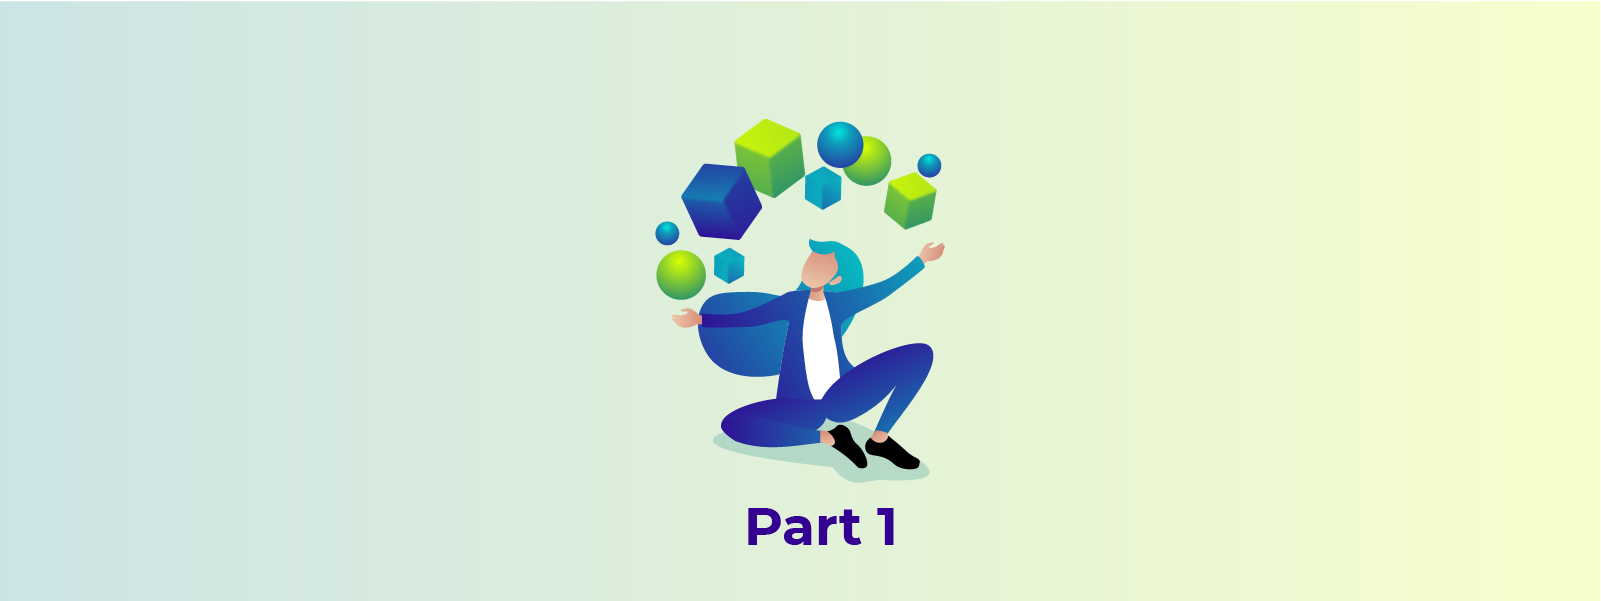 B-enjeux-objectifs-projet-datagouv-1